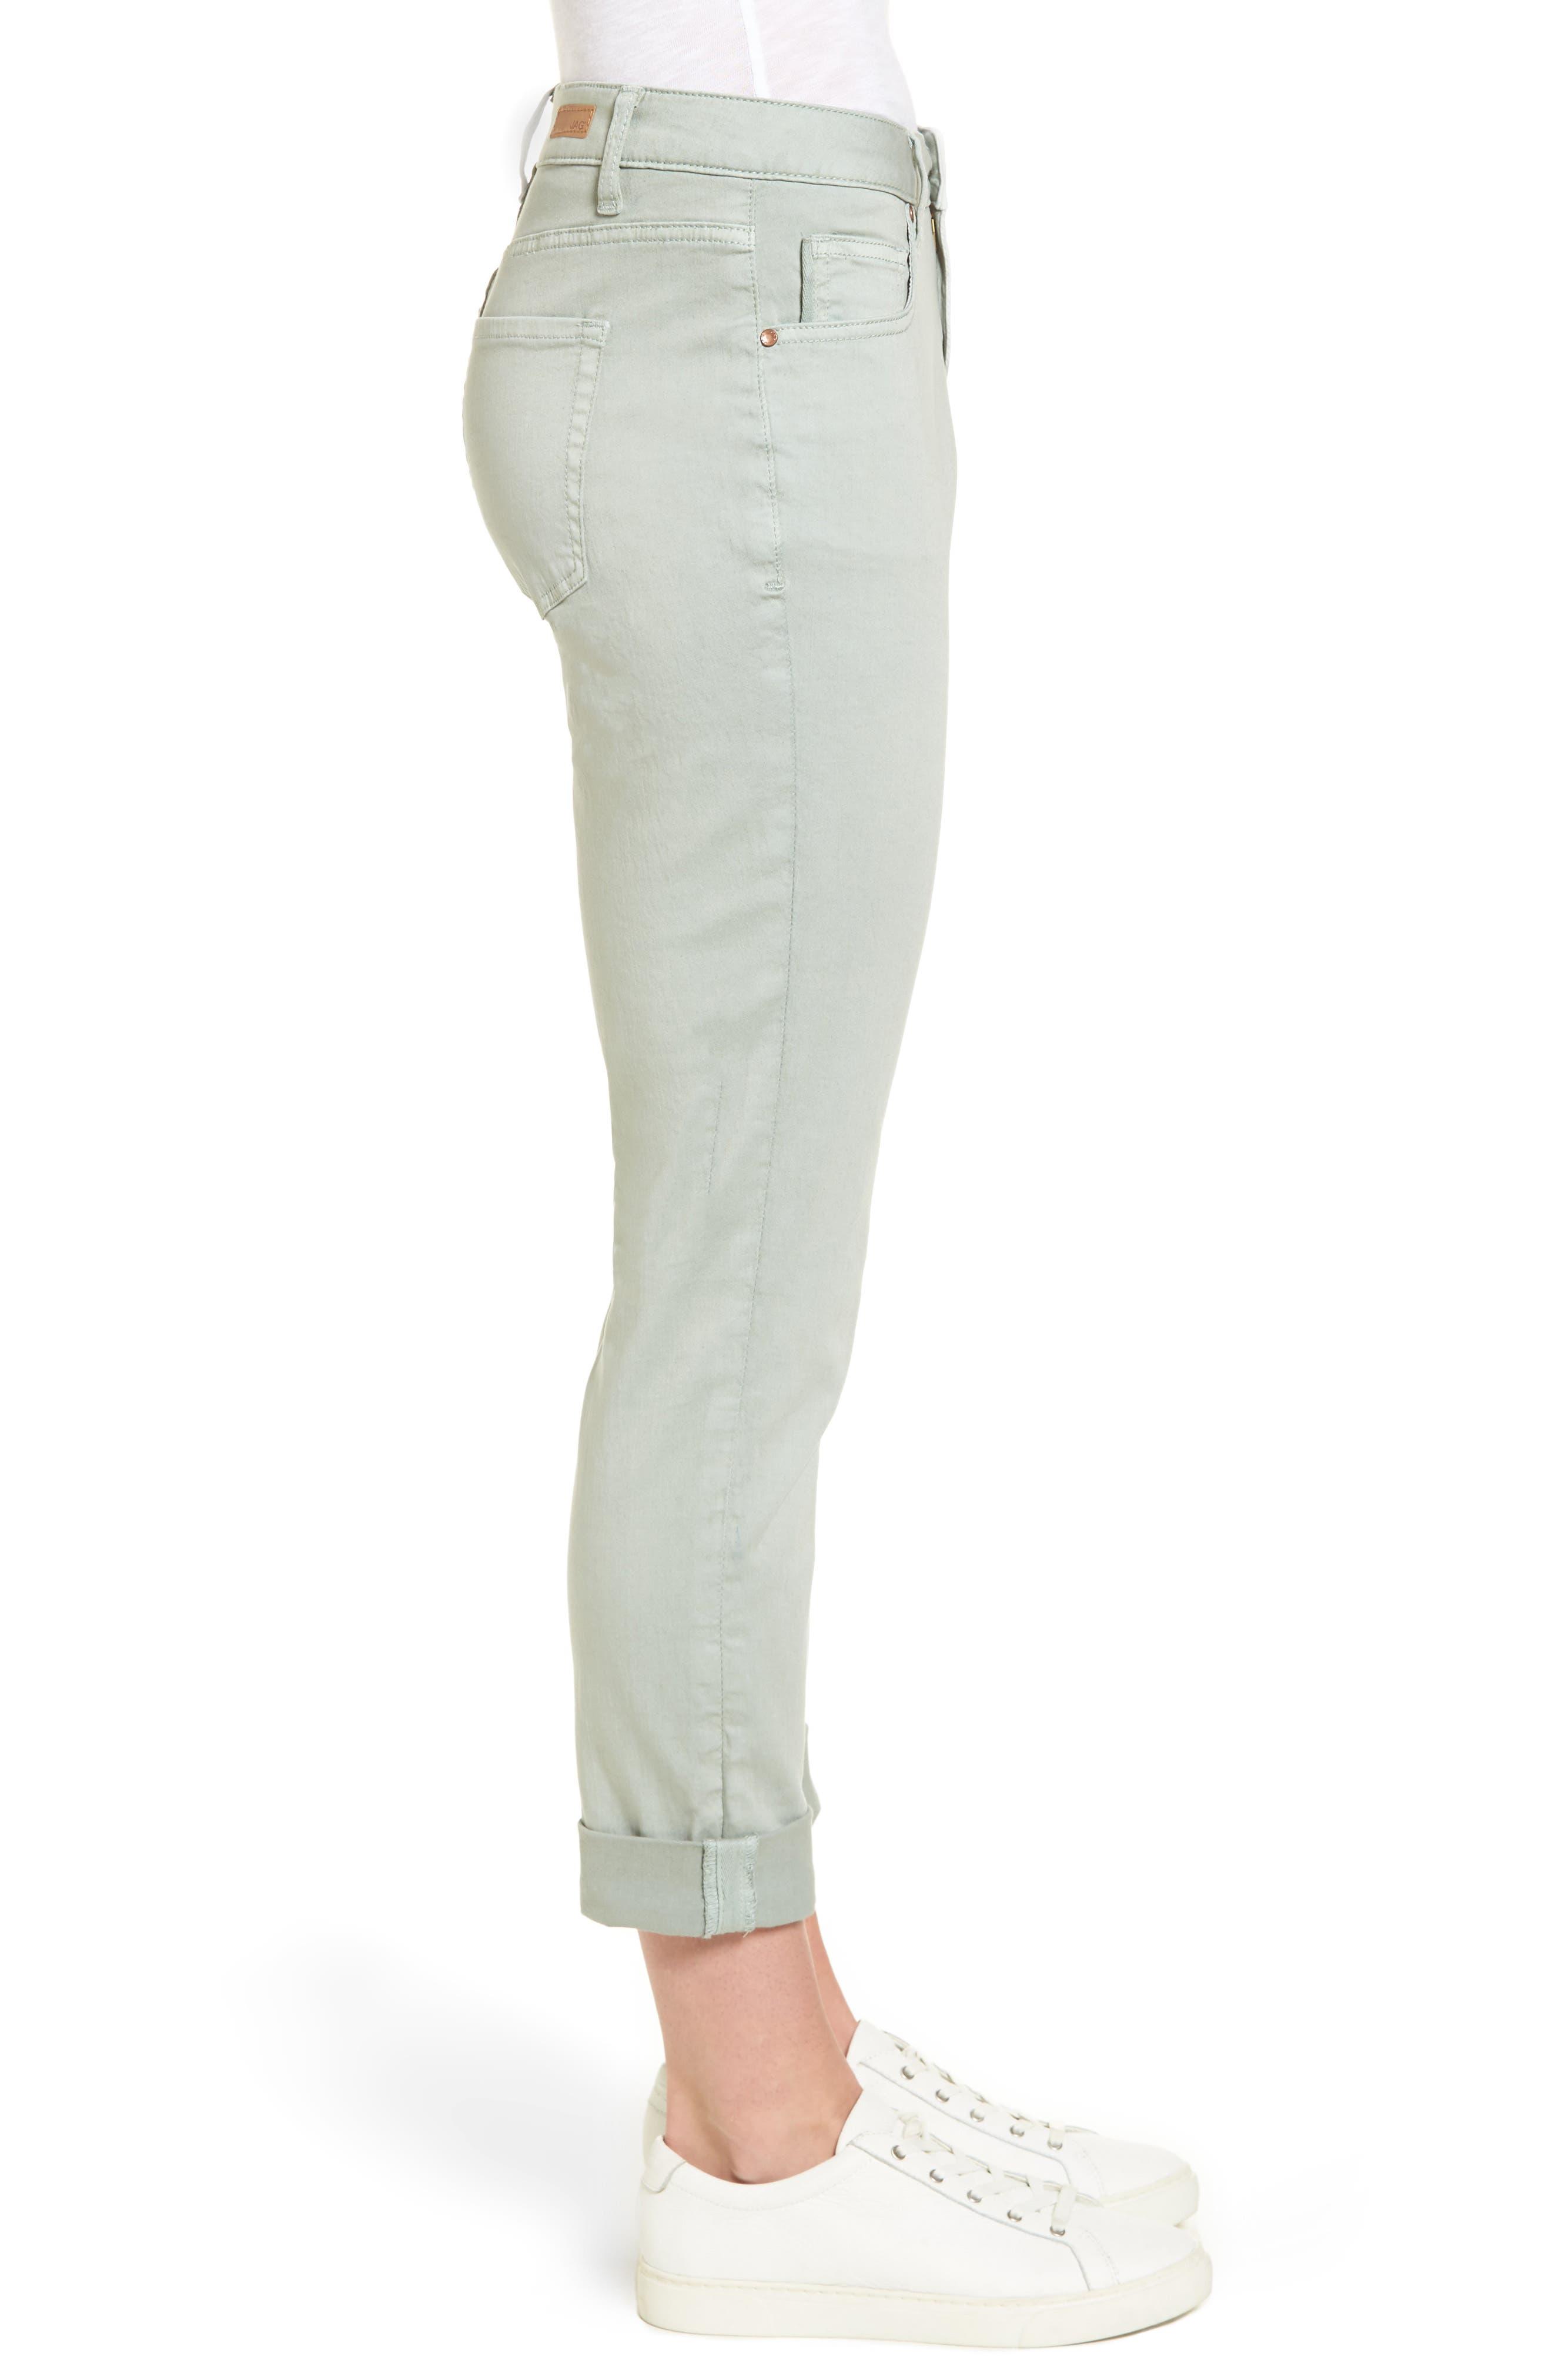 Carter Knit Denim Girlfriend Jeans,                             Alternate thumbnail 3, color,                             Beach Glass